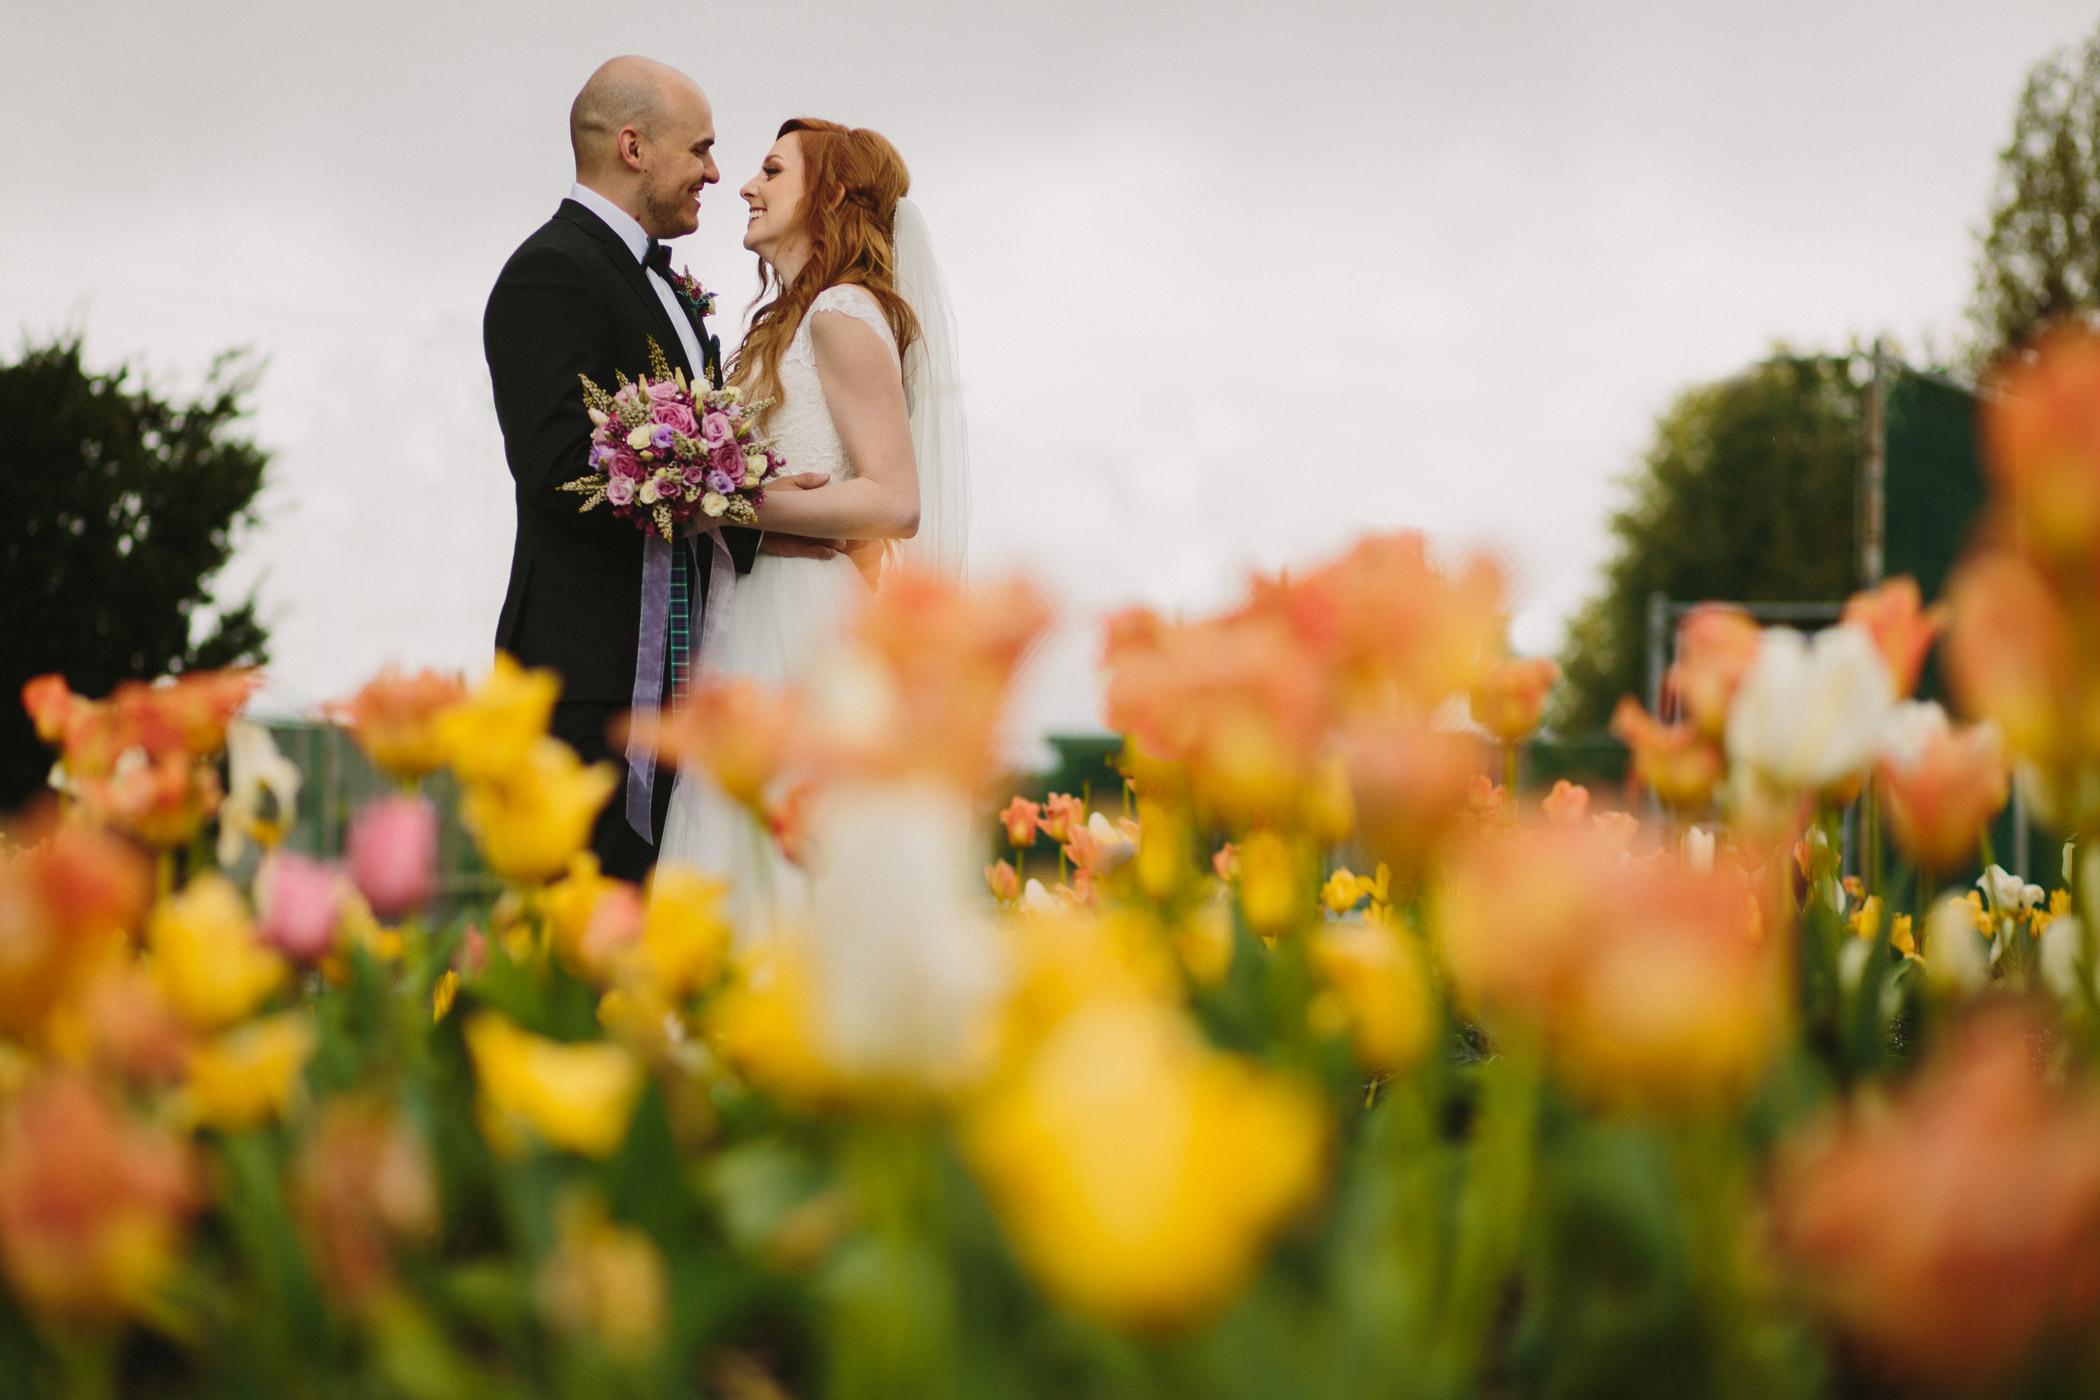 New Westminster Wedding Portrait in Tulips